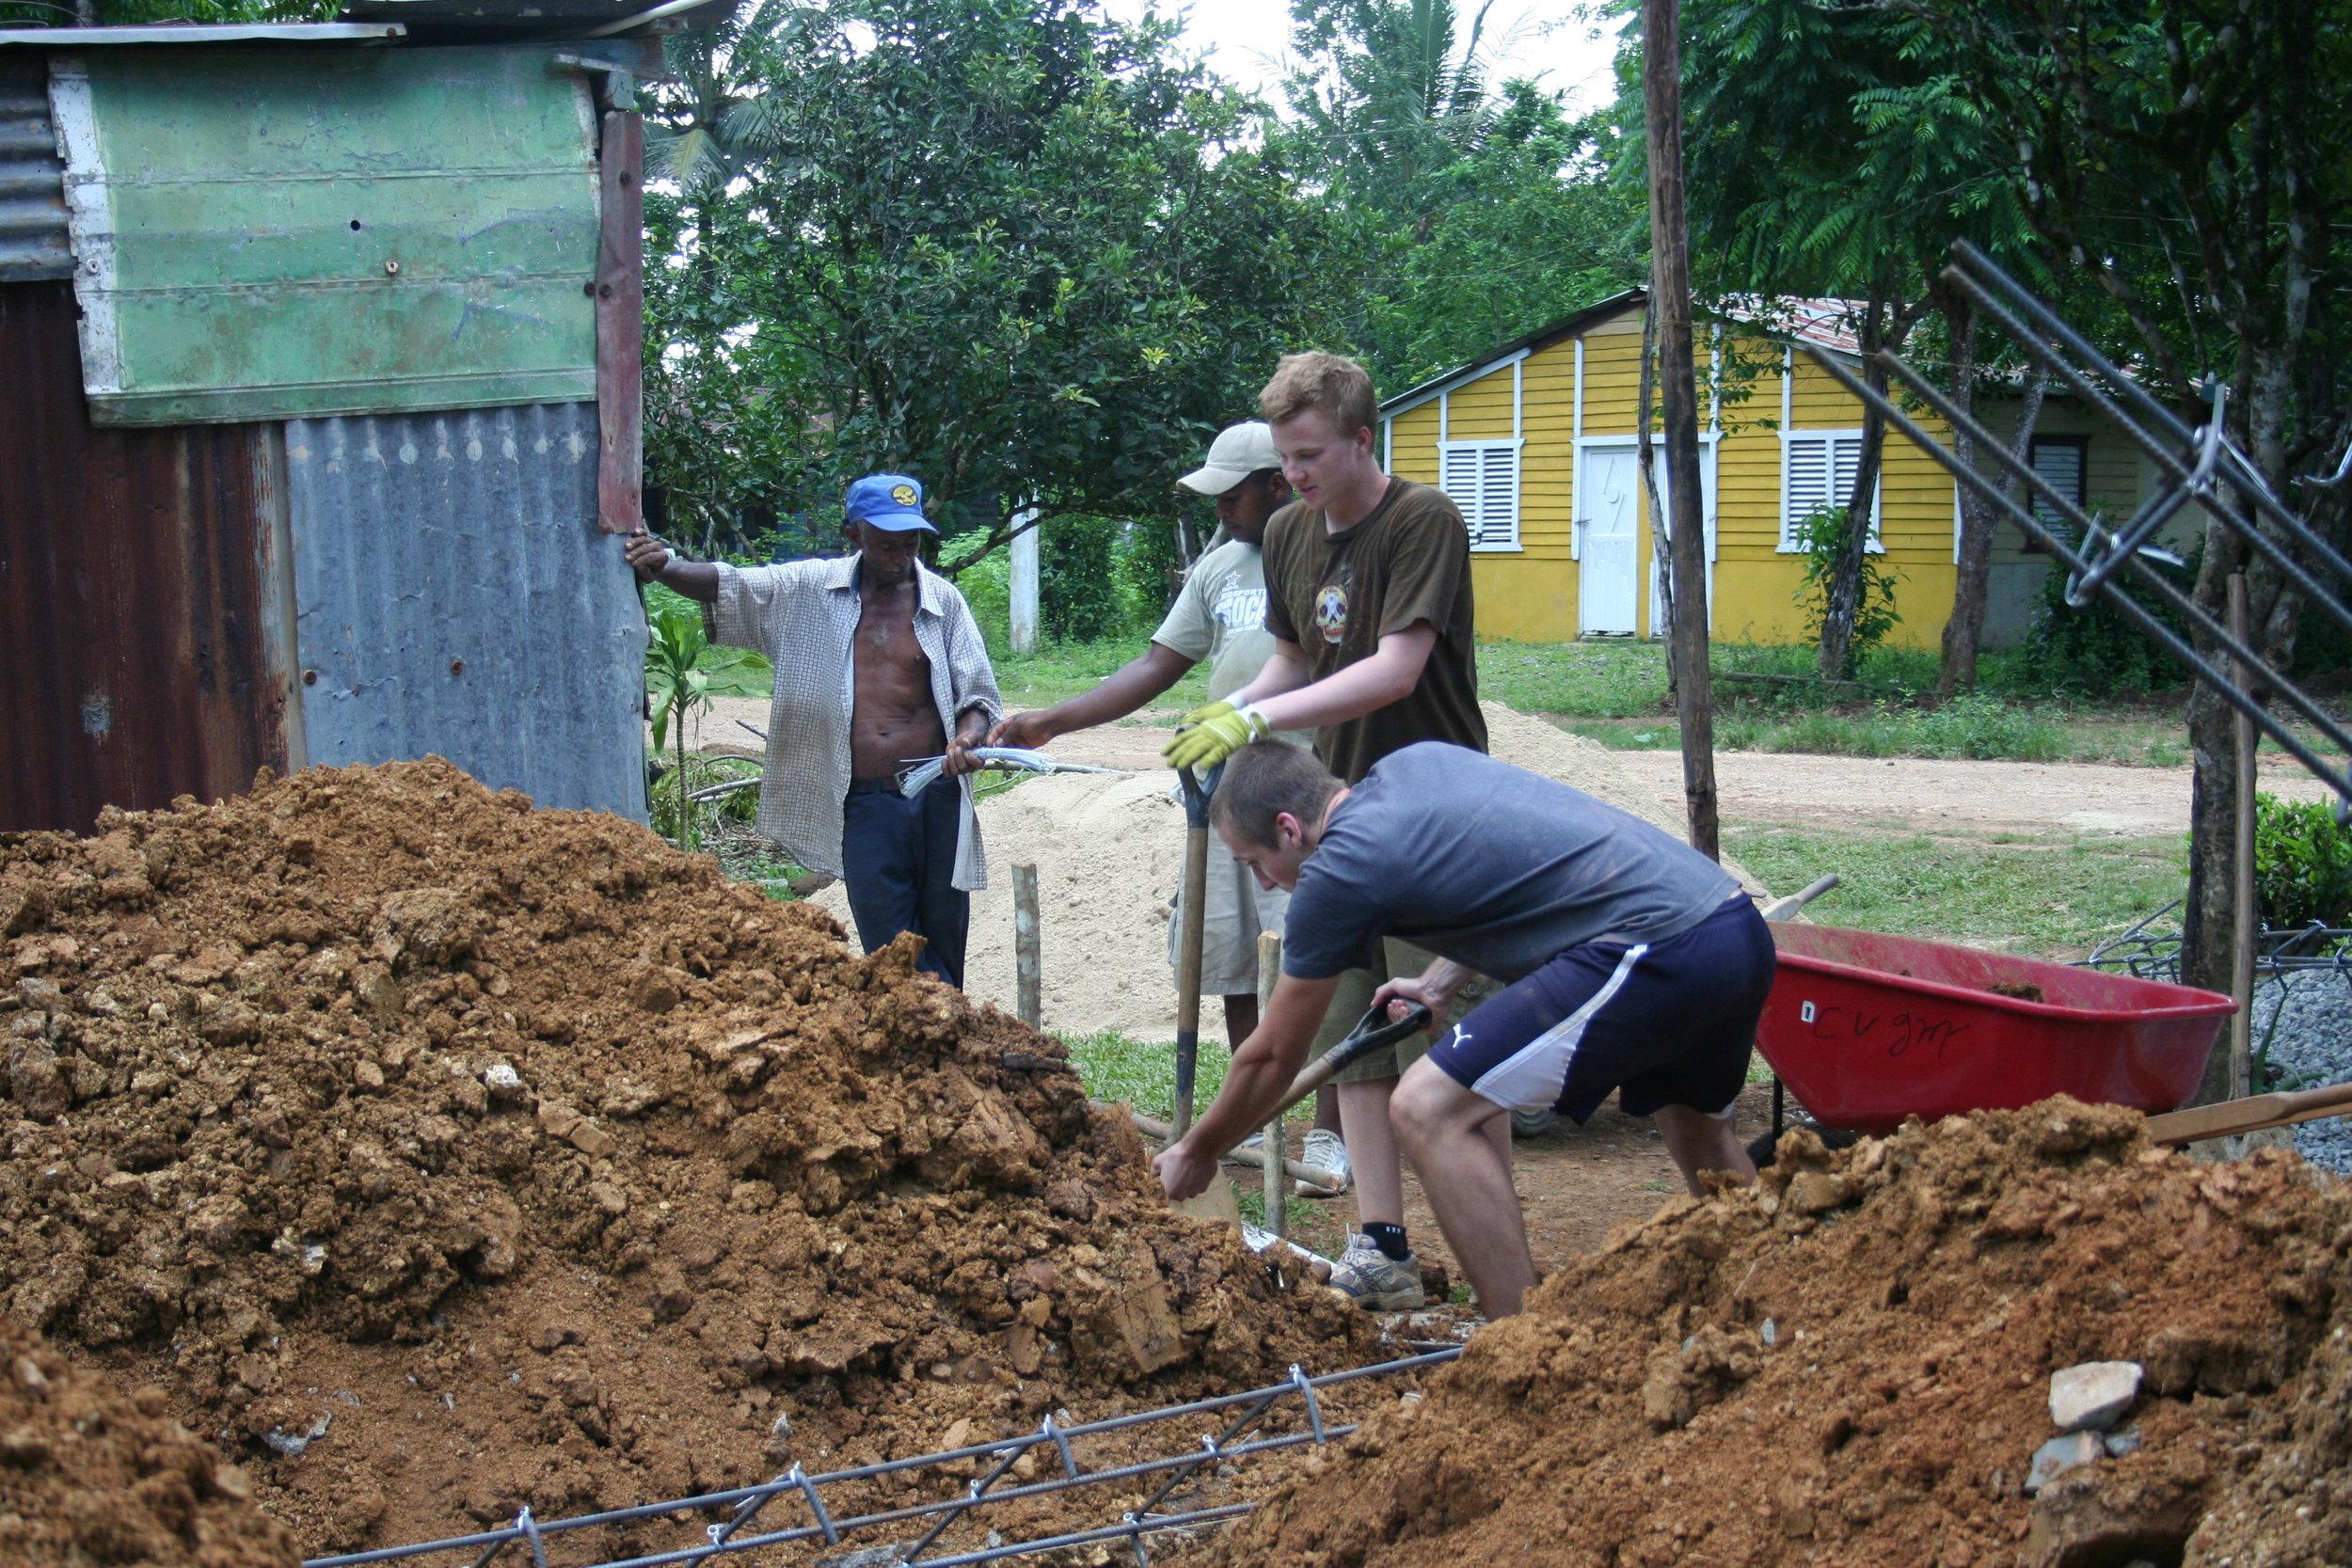 Digging new homefoundation